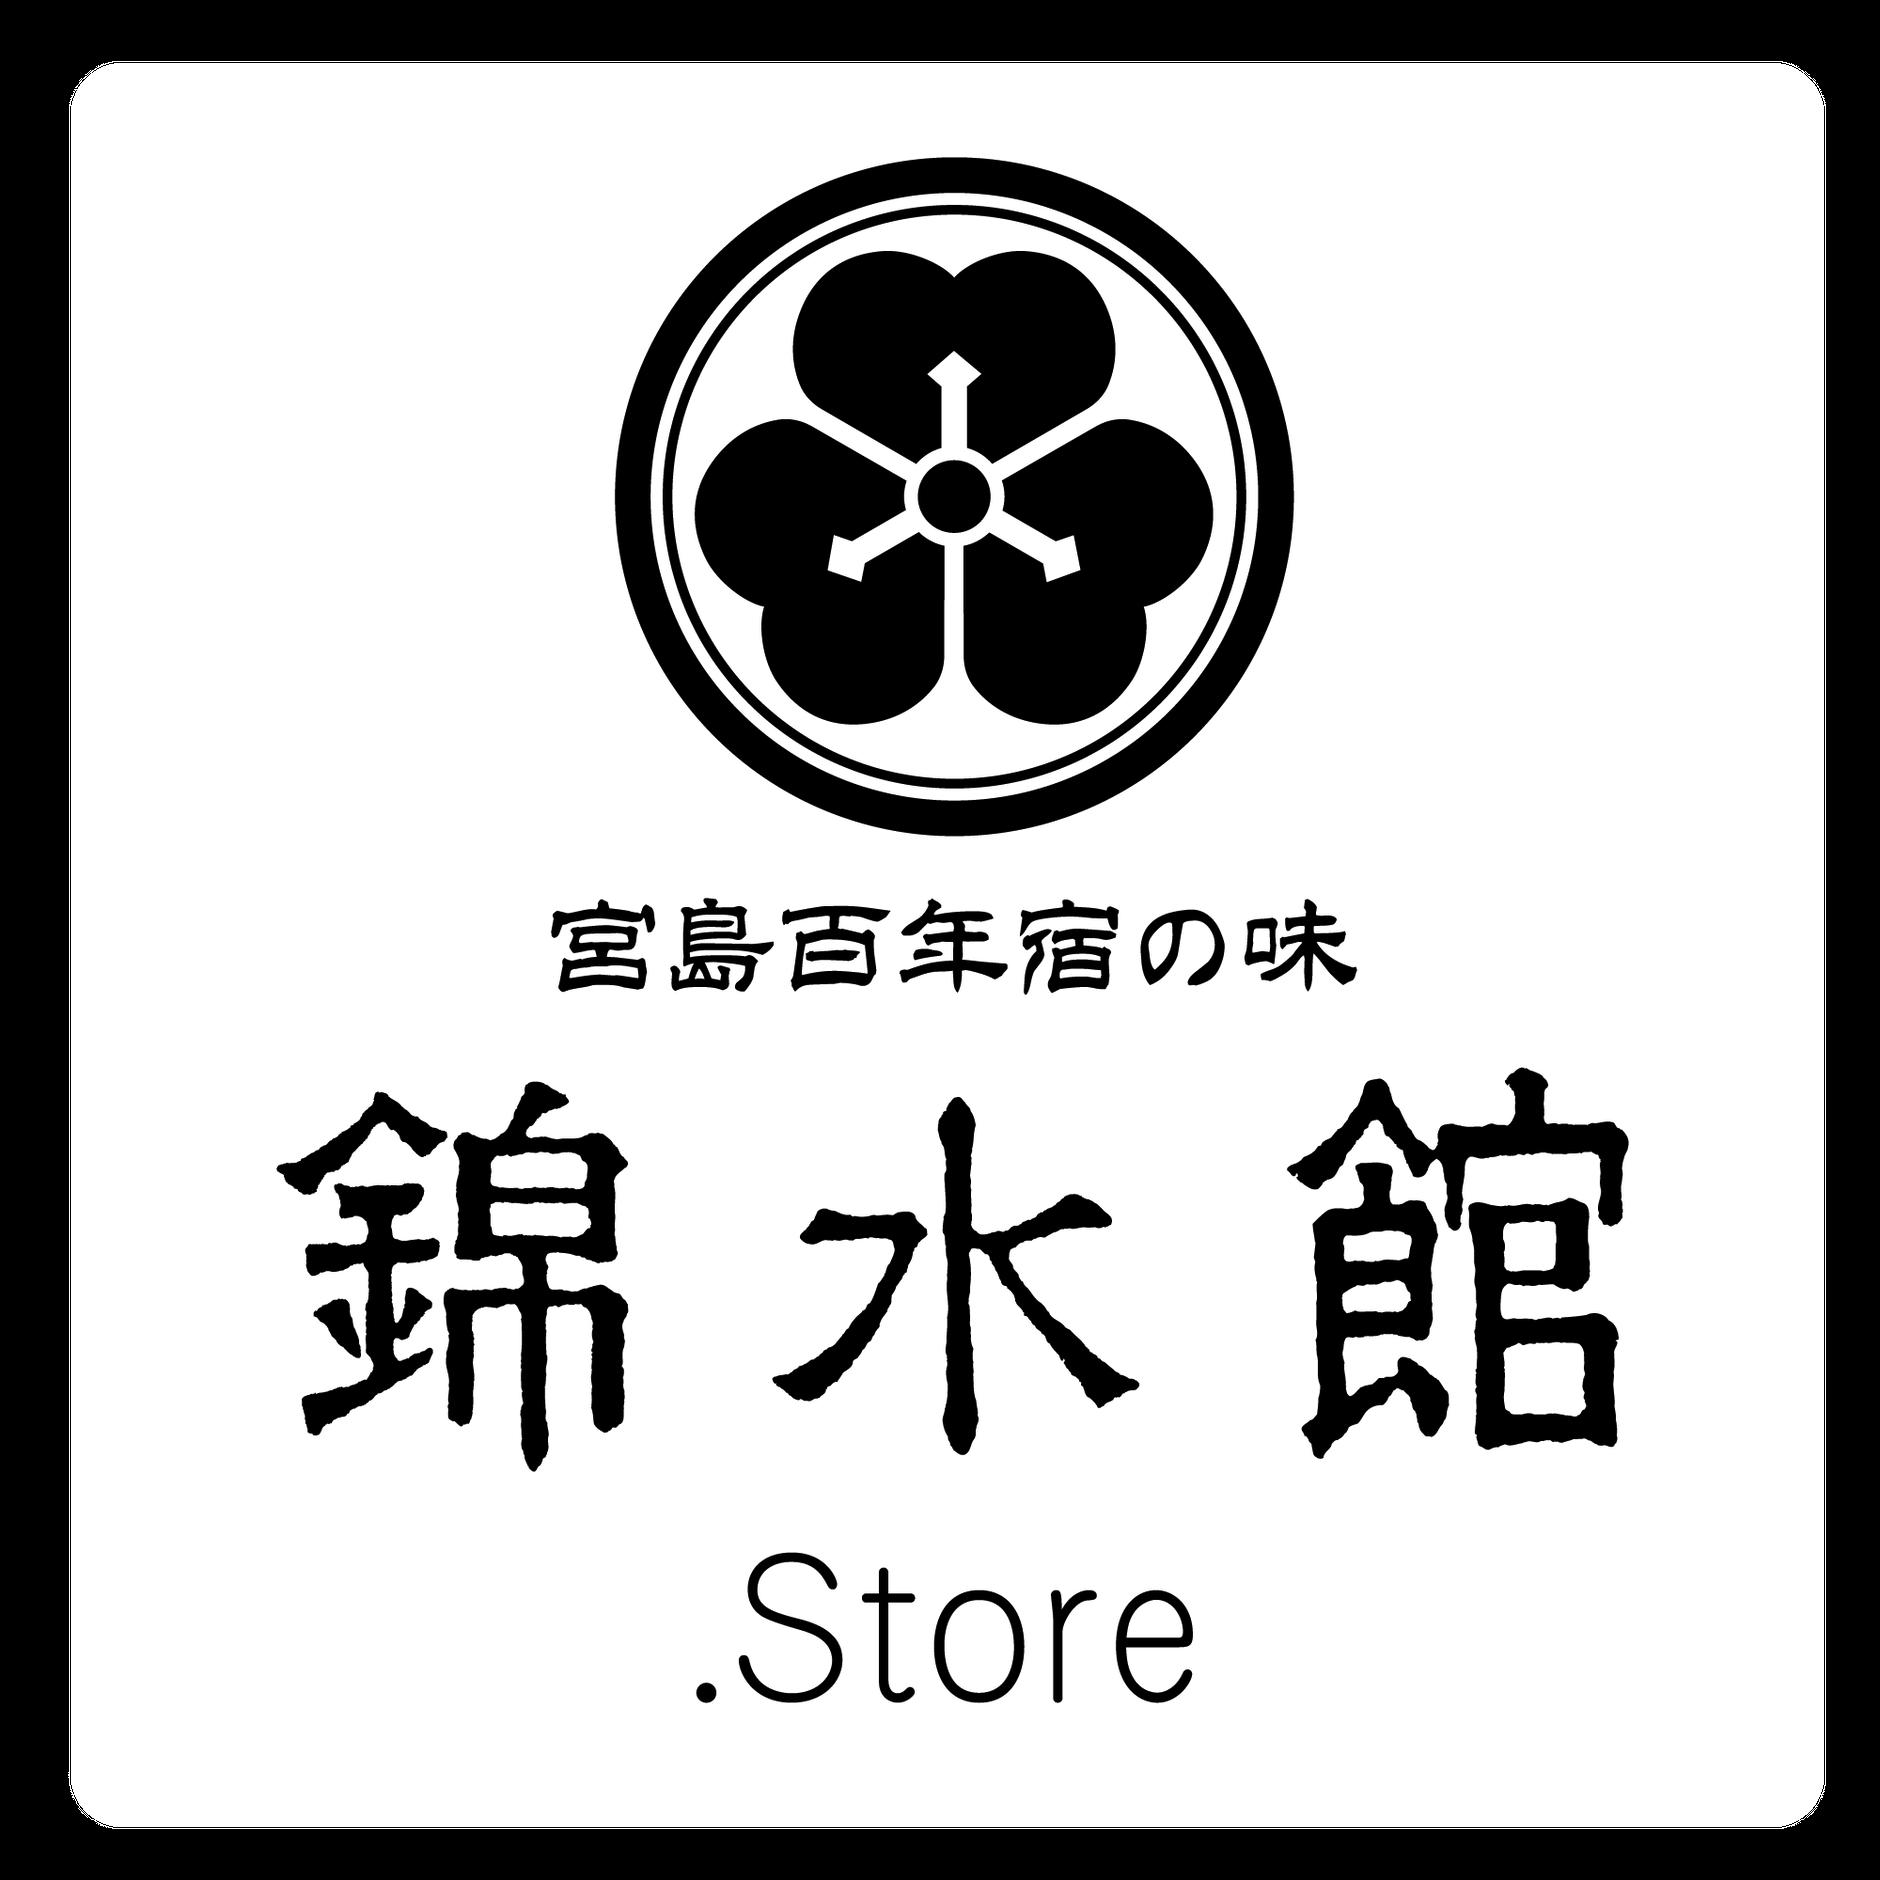 宮島 錦水館.store